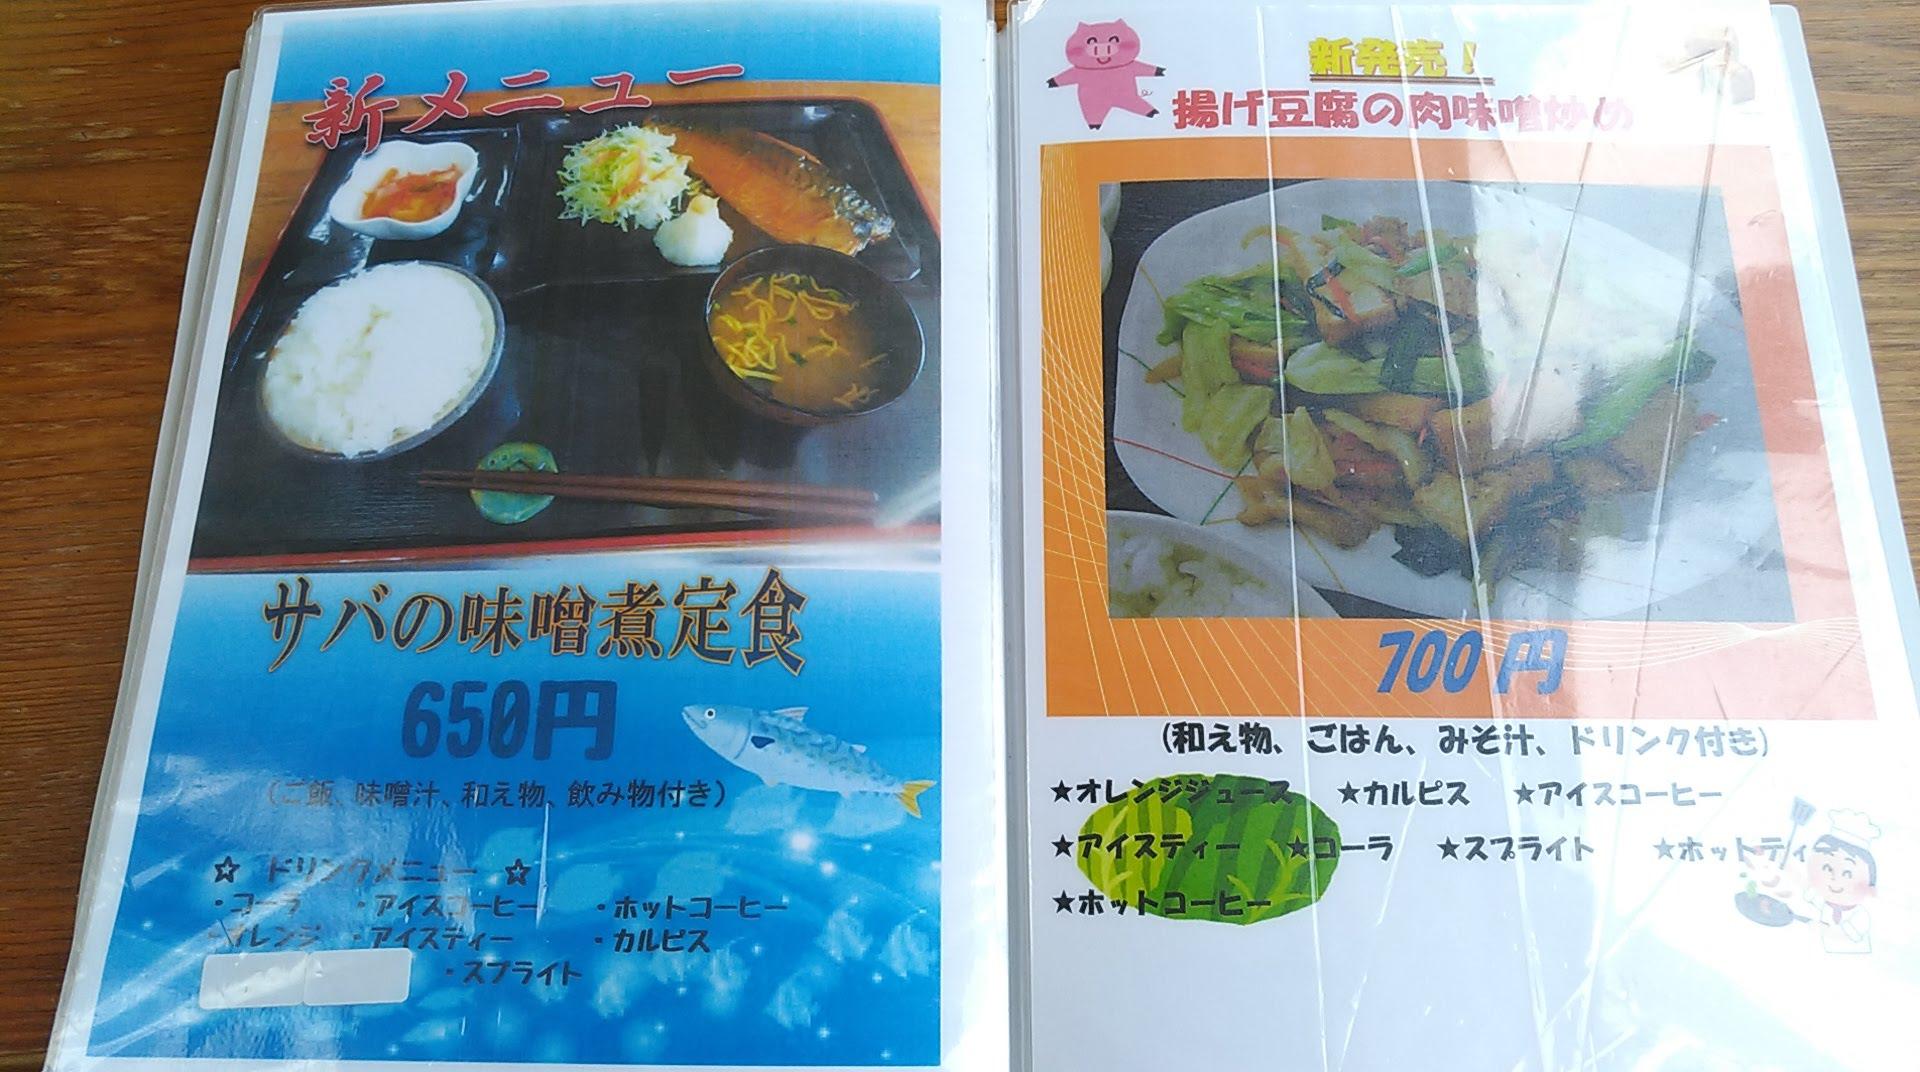 the menu of Pure shokudou 12